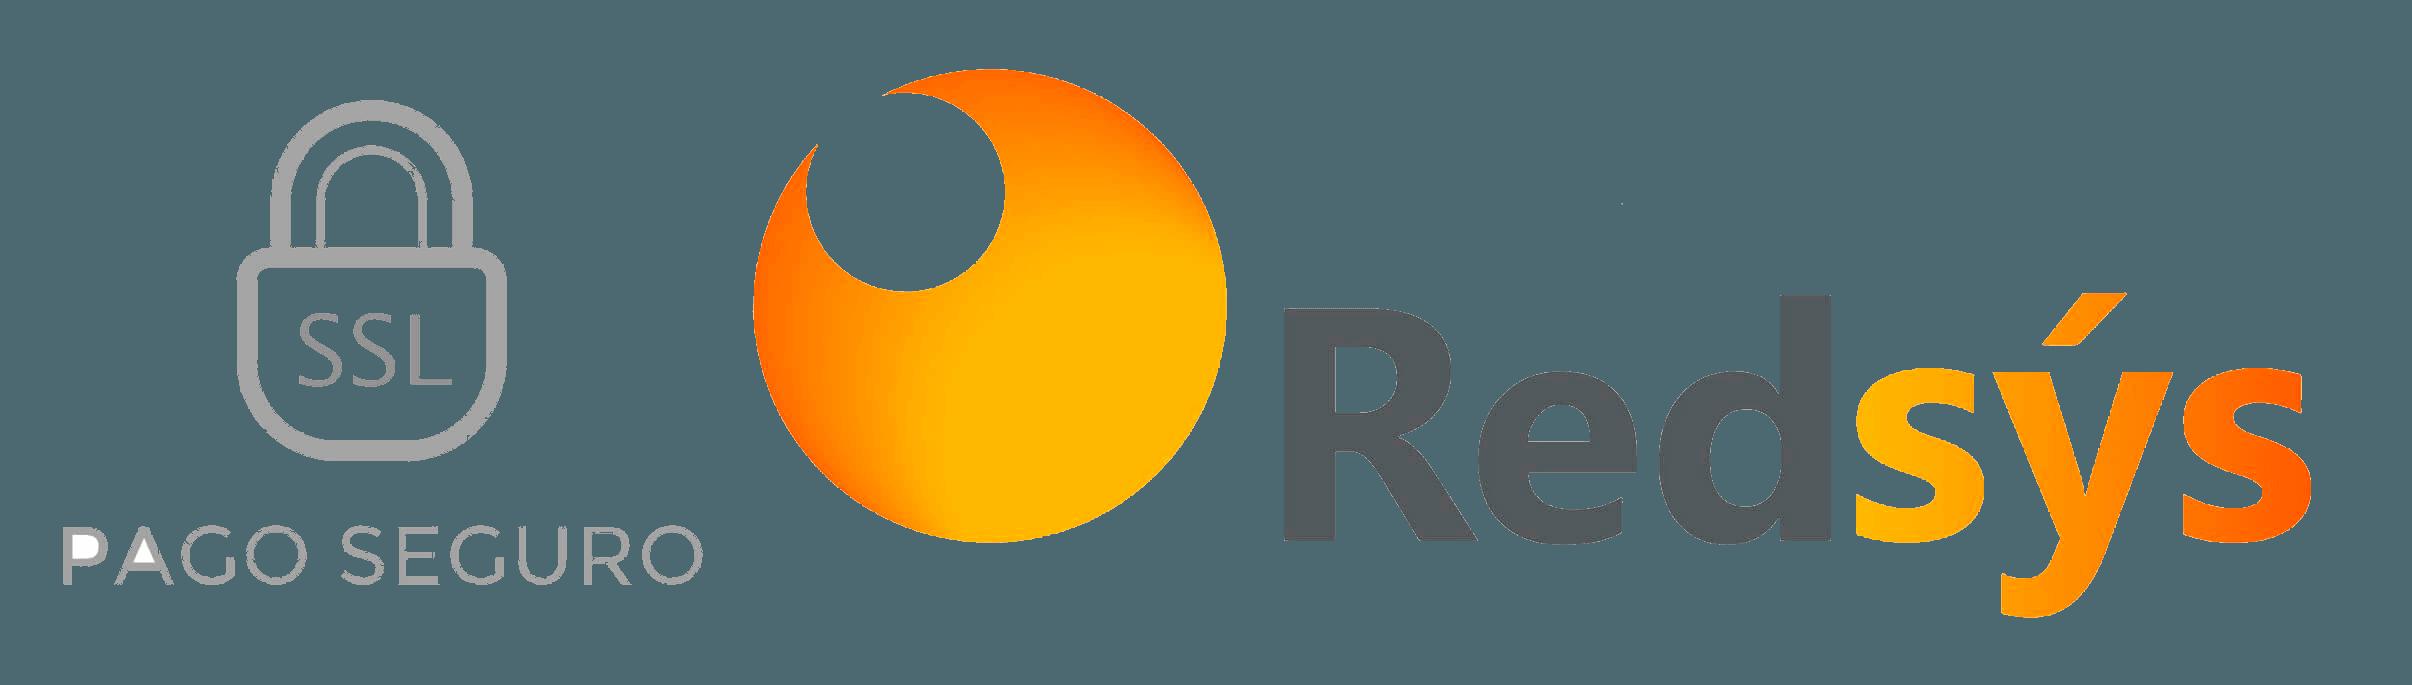 Logotipo Pago Seguro